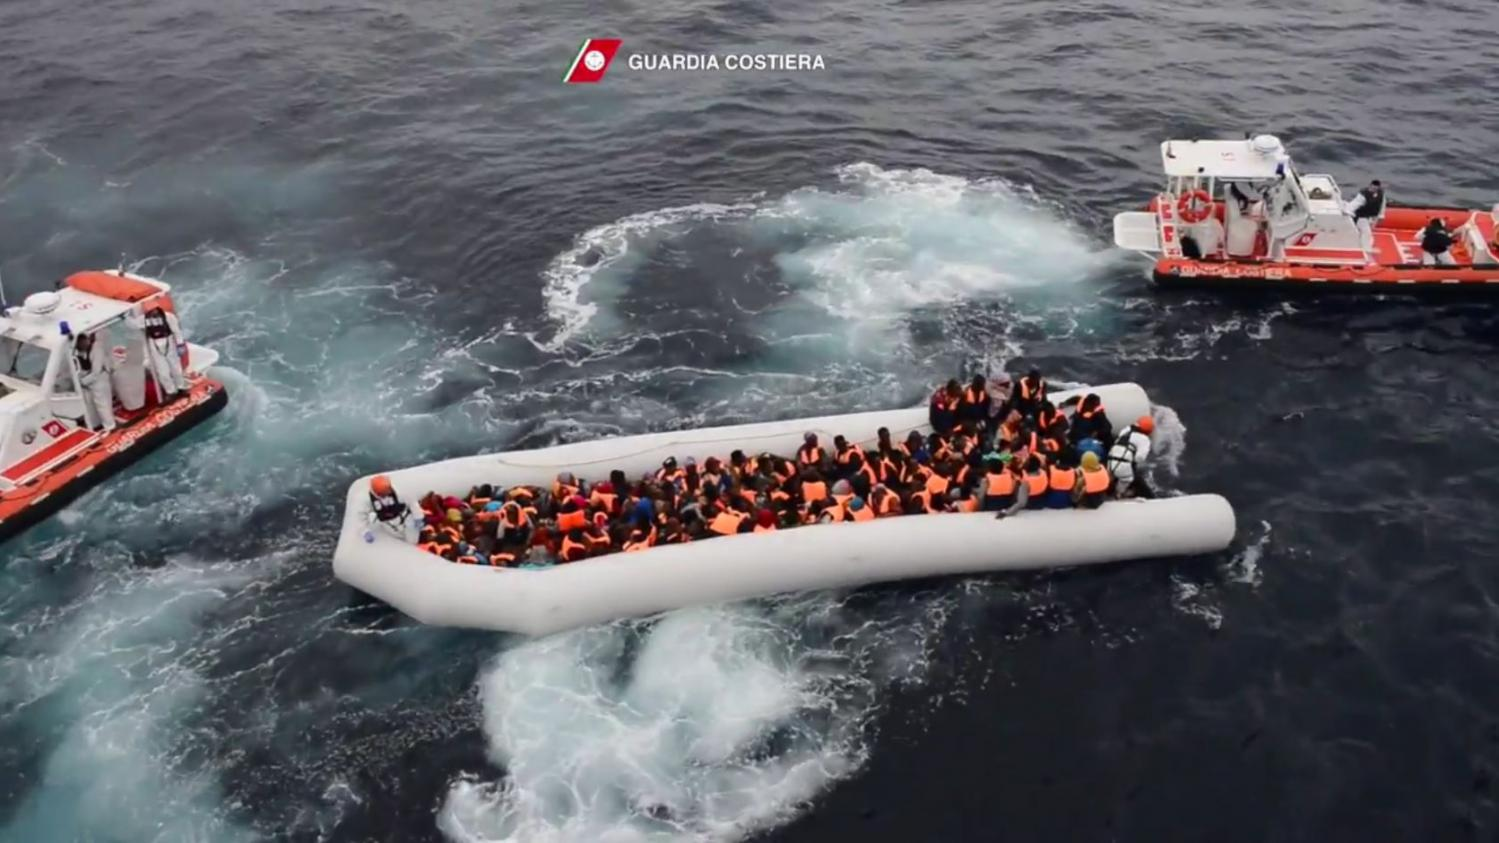 monde europe politique cohesion menacee